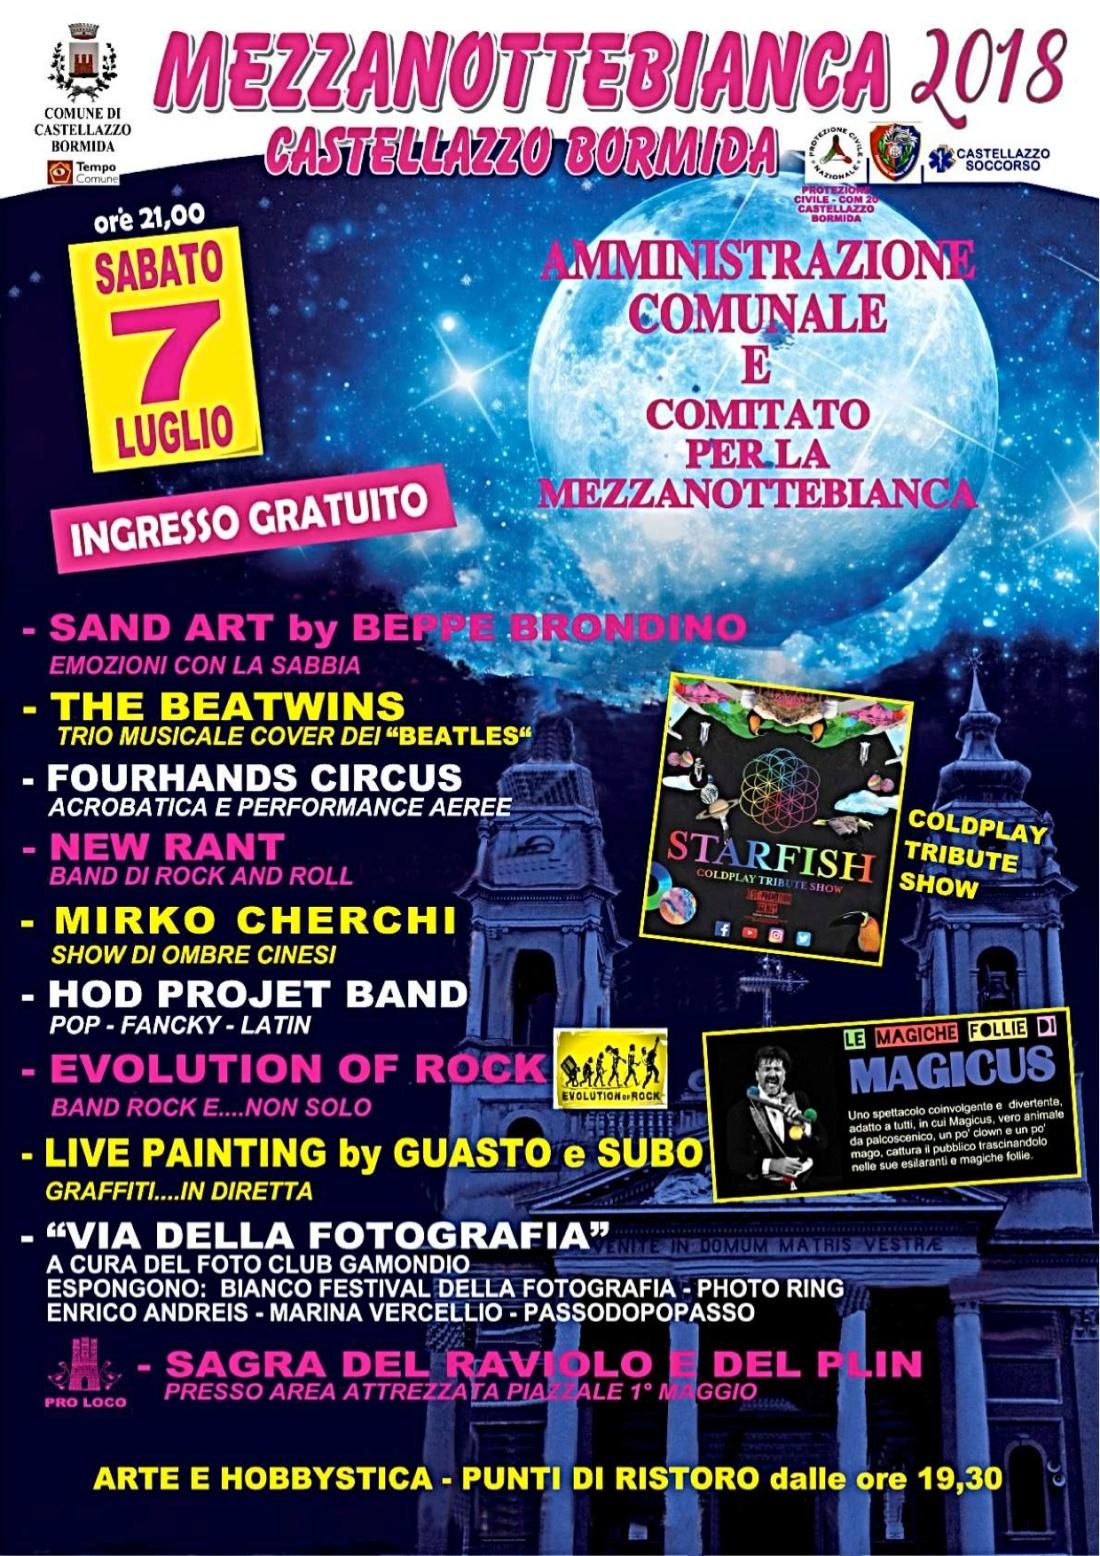 mot 3_73° Motoraduno_Locandina Castellazzo_Mezzanotte bianca